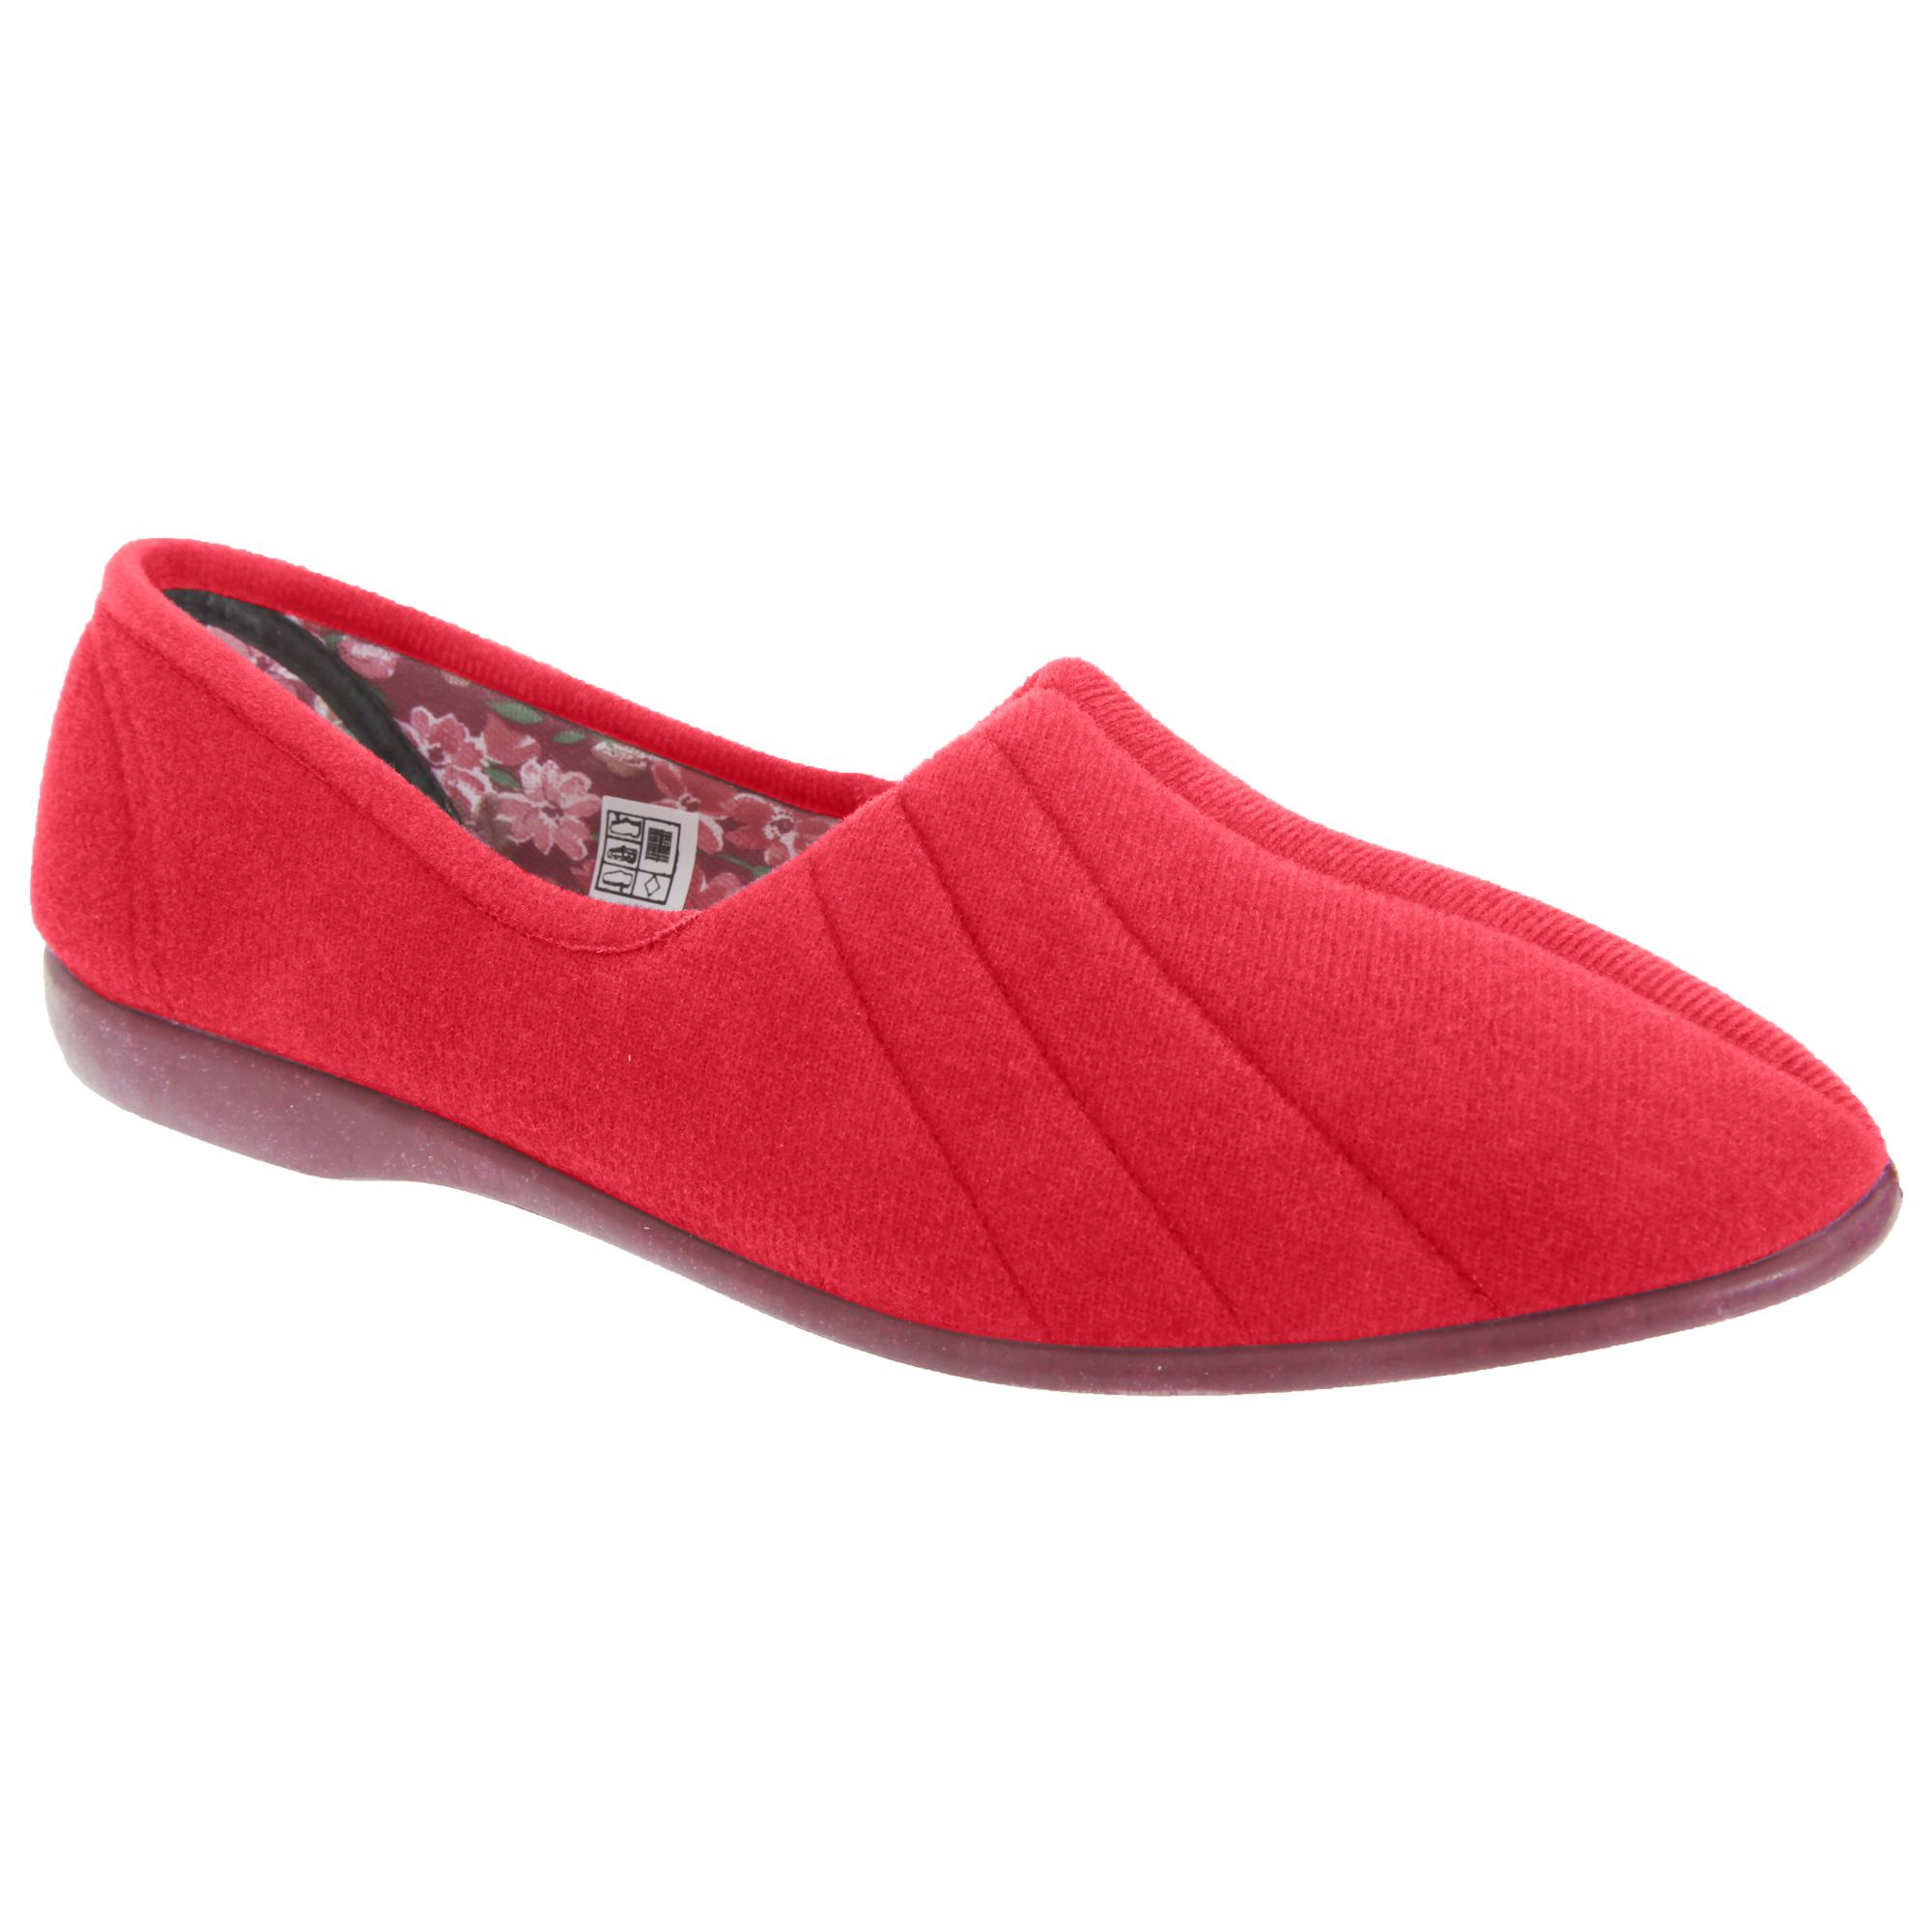 Ladies Slip On House Shoes